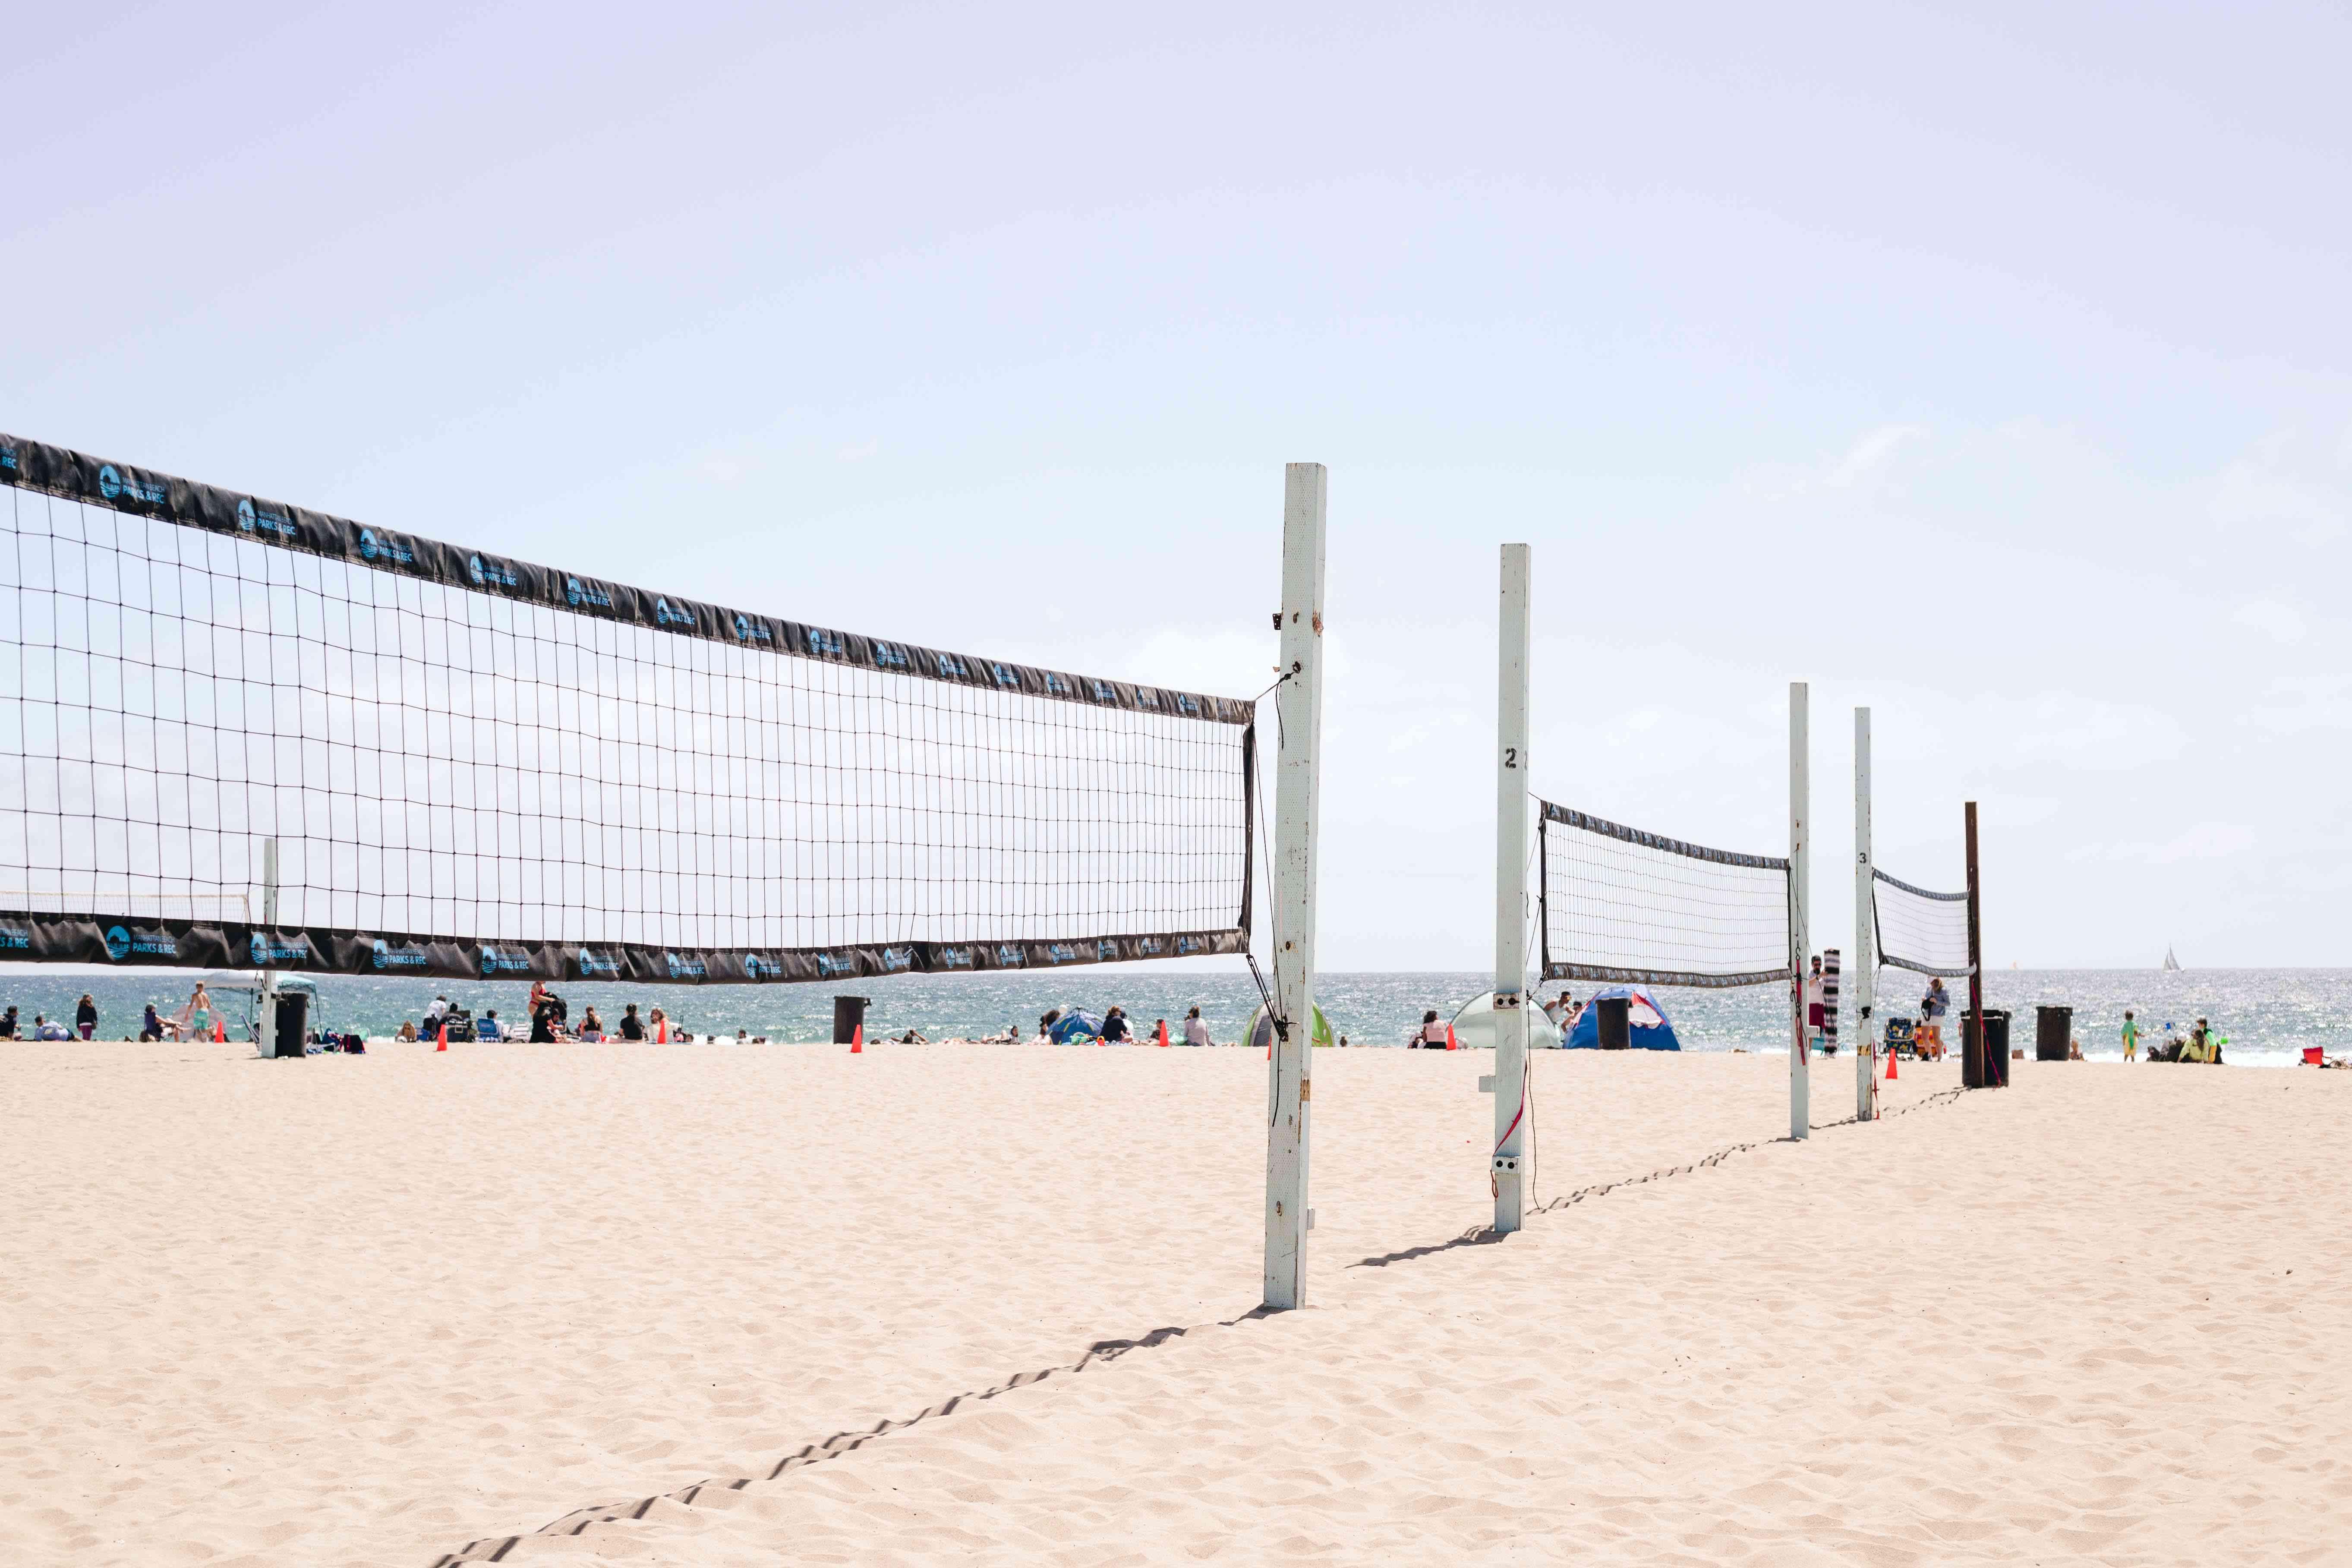 Volleyball area on Manhattan Beach, LA